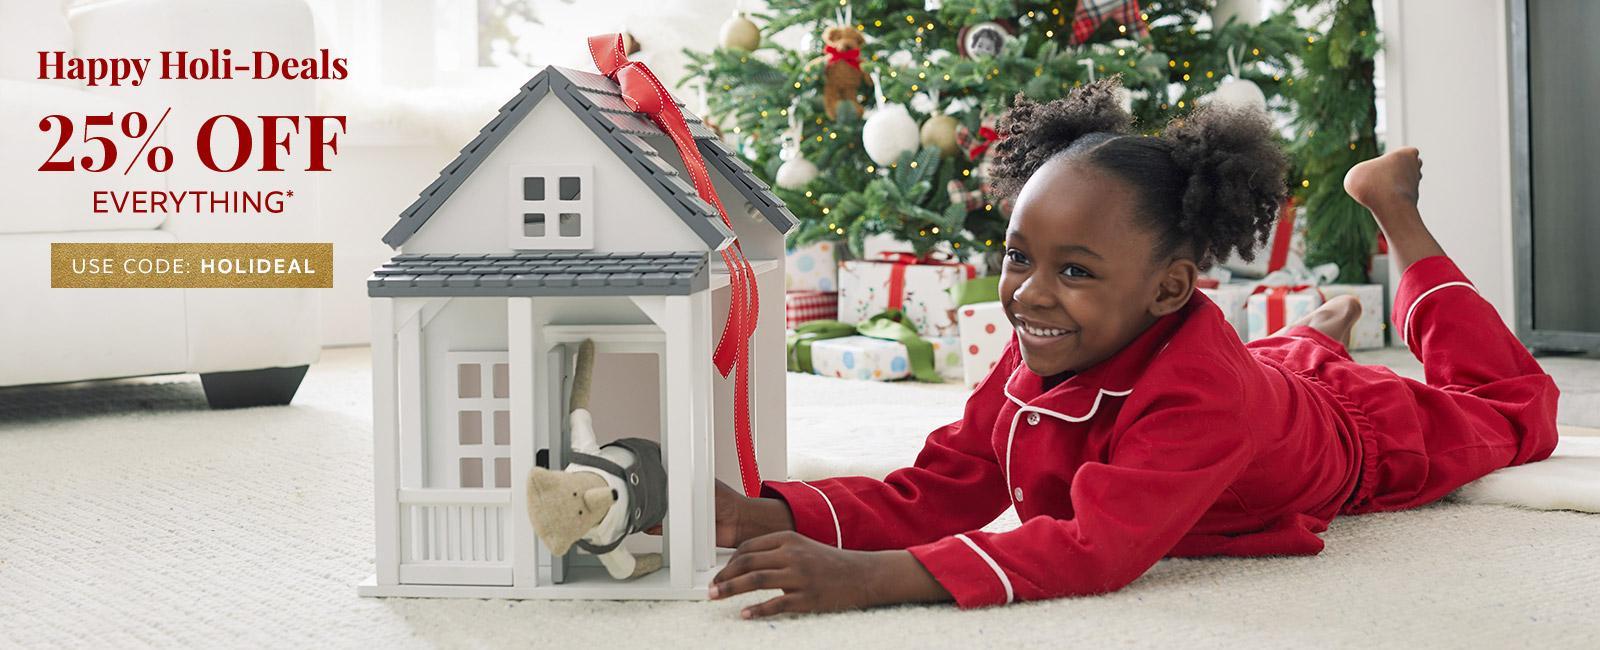 Kids Baby Furniture Kids Bedding Gifts Baby Registry Pottery Barn Kids